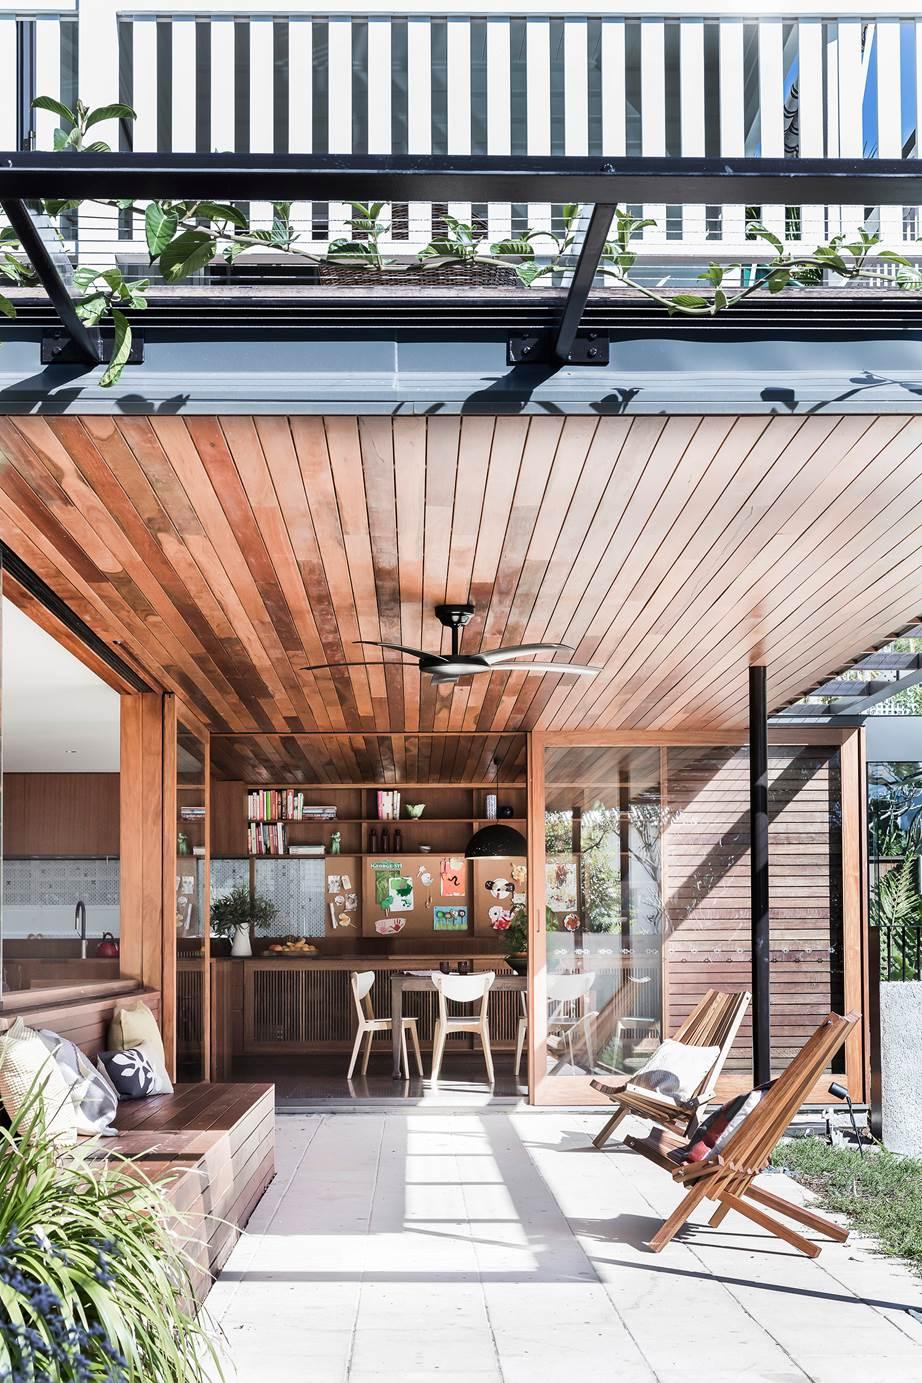 Kieron Gait Upside Down House